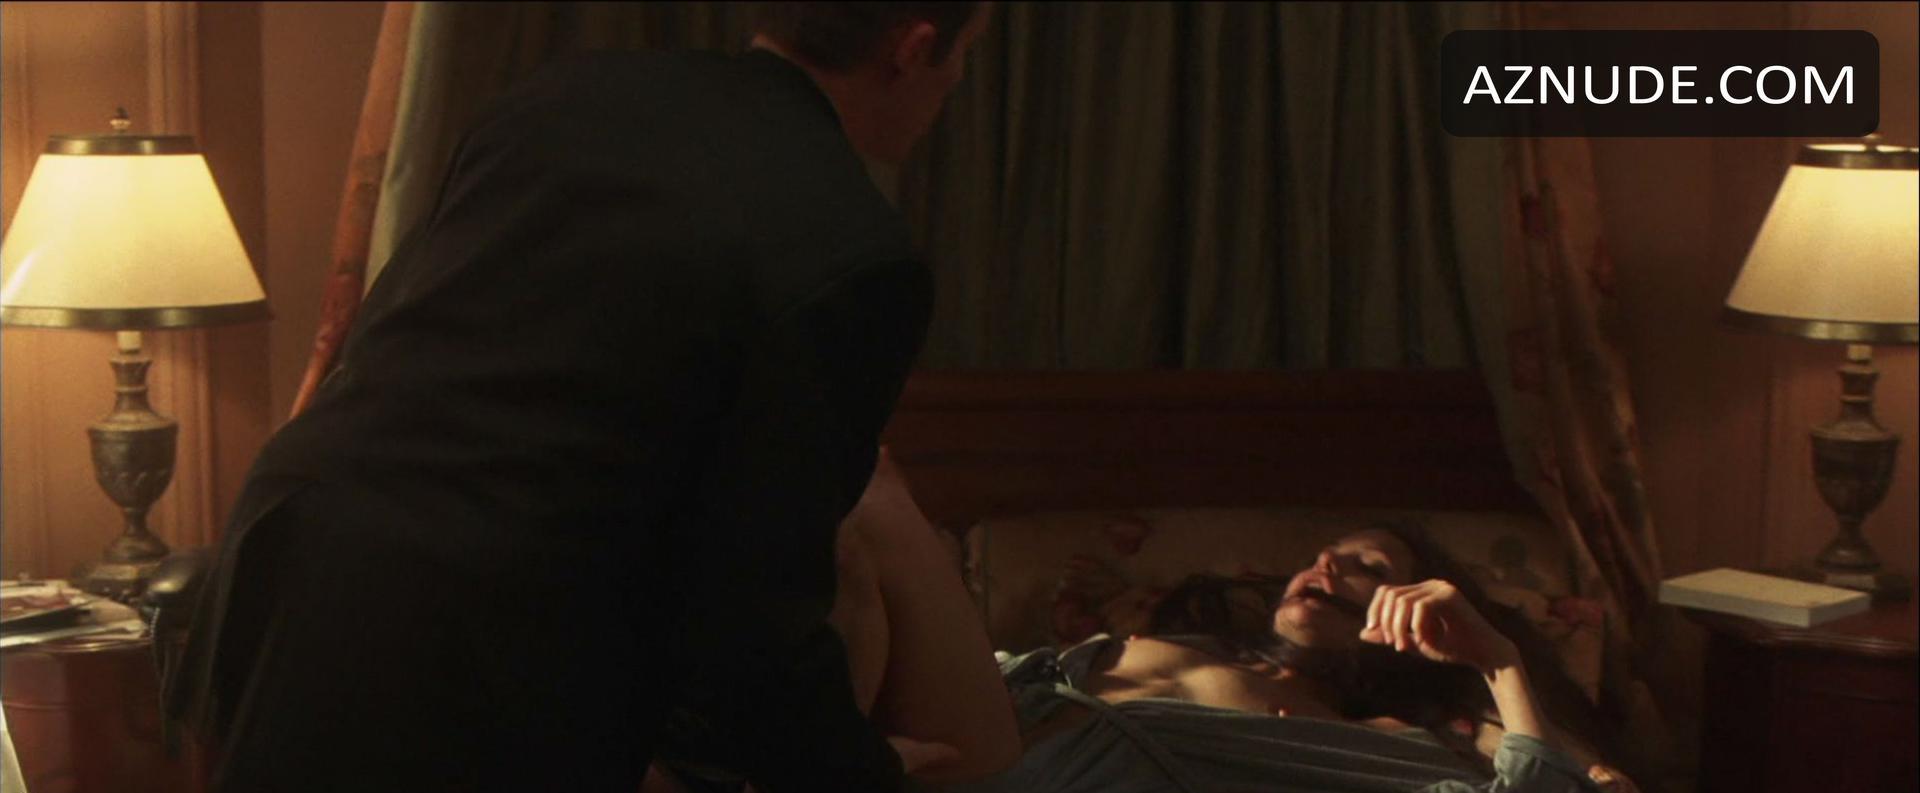 Angelina Jolie Naked Taking Lives taking lives nude scenes - aznude